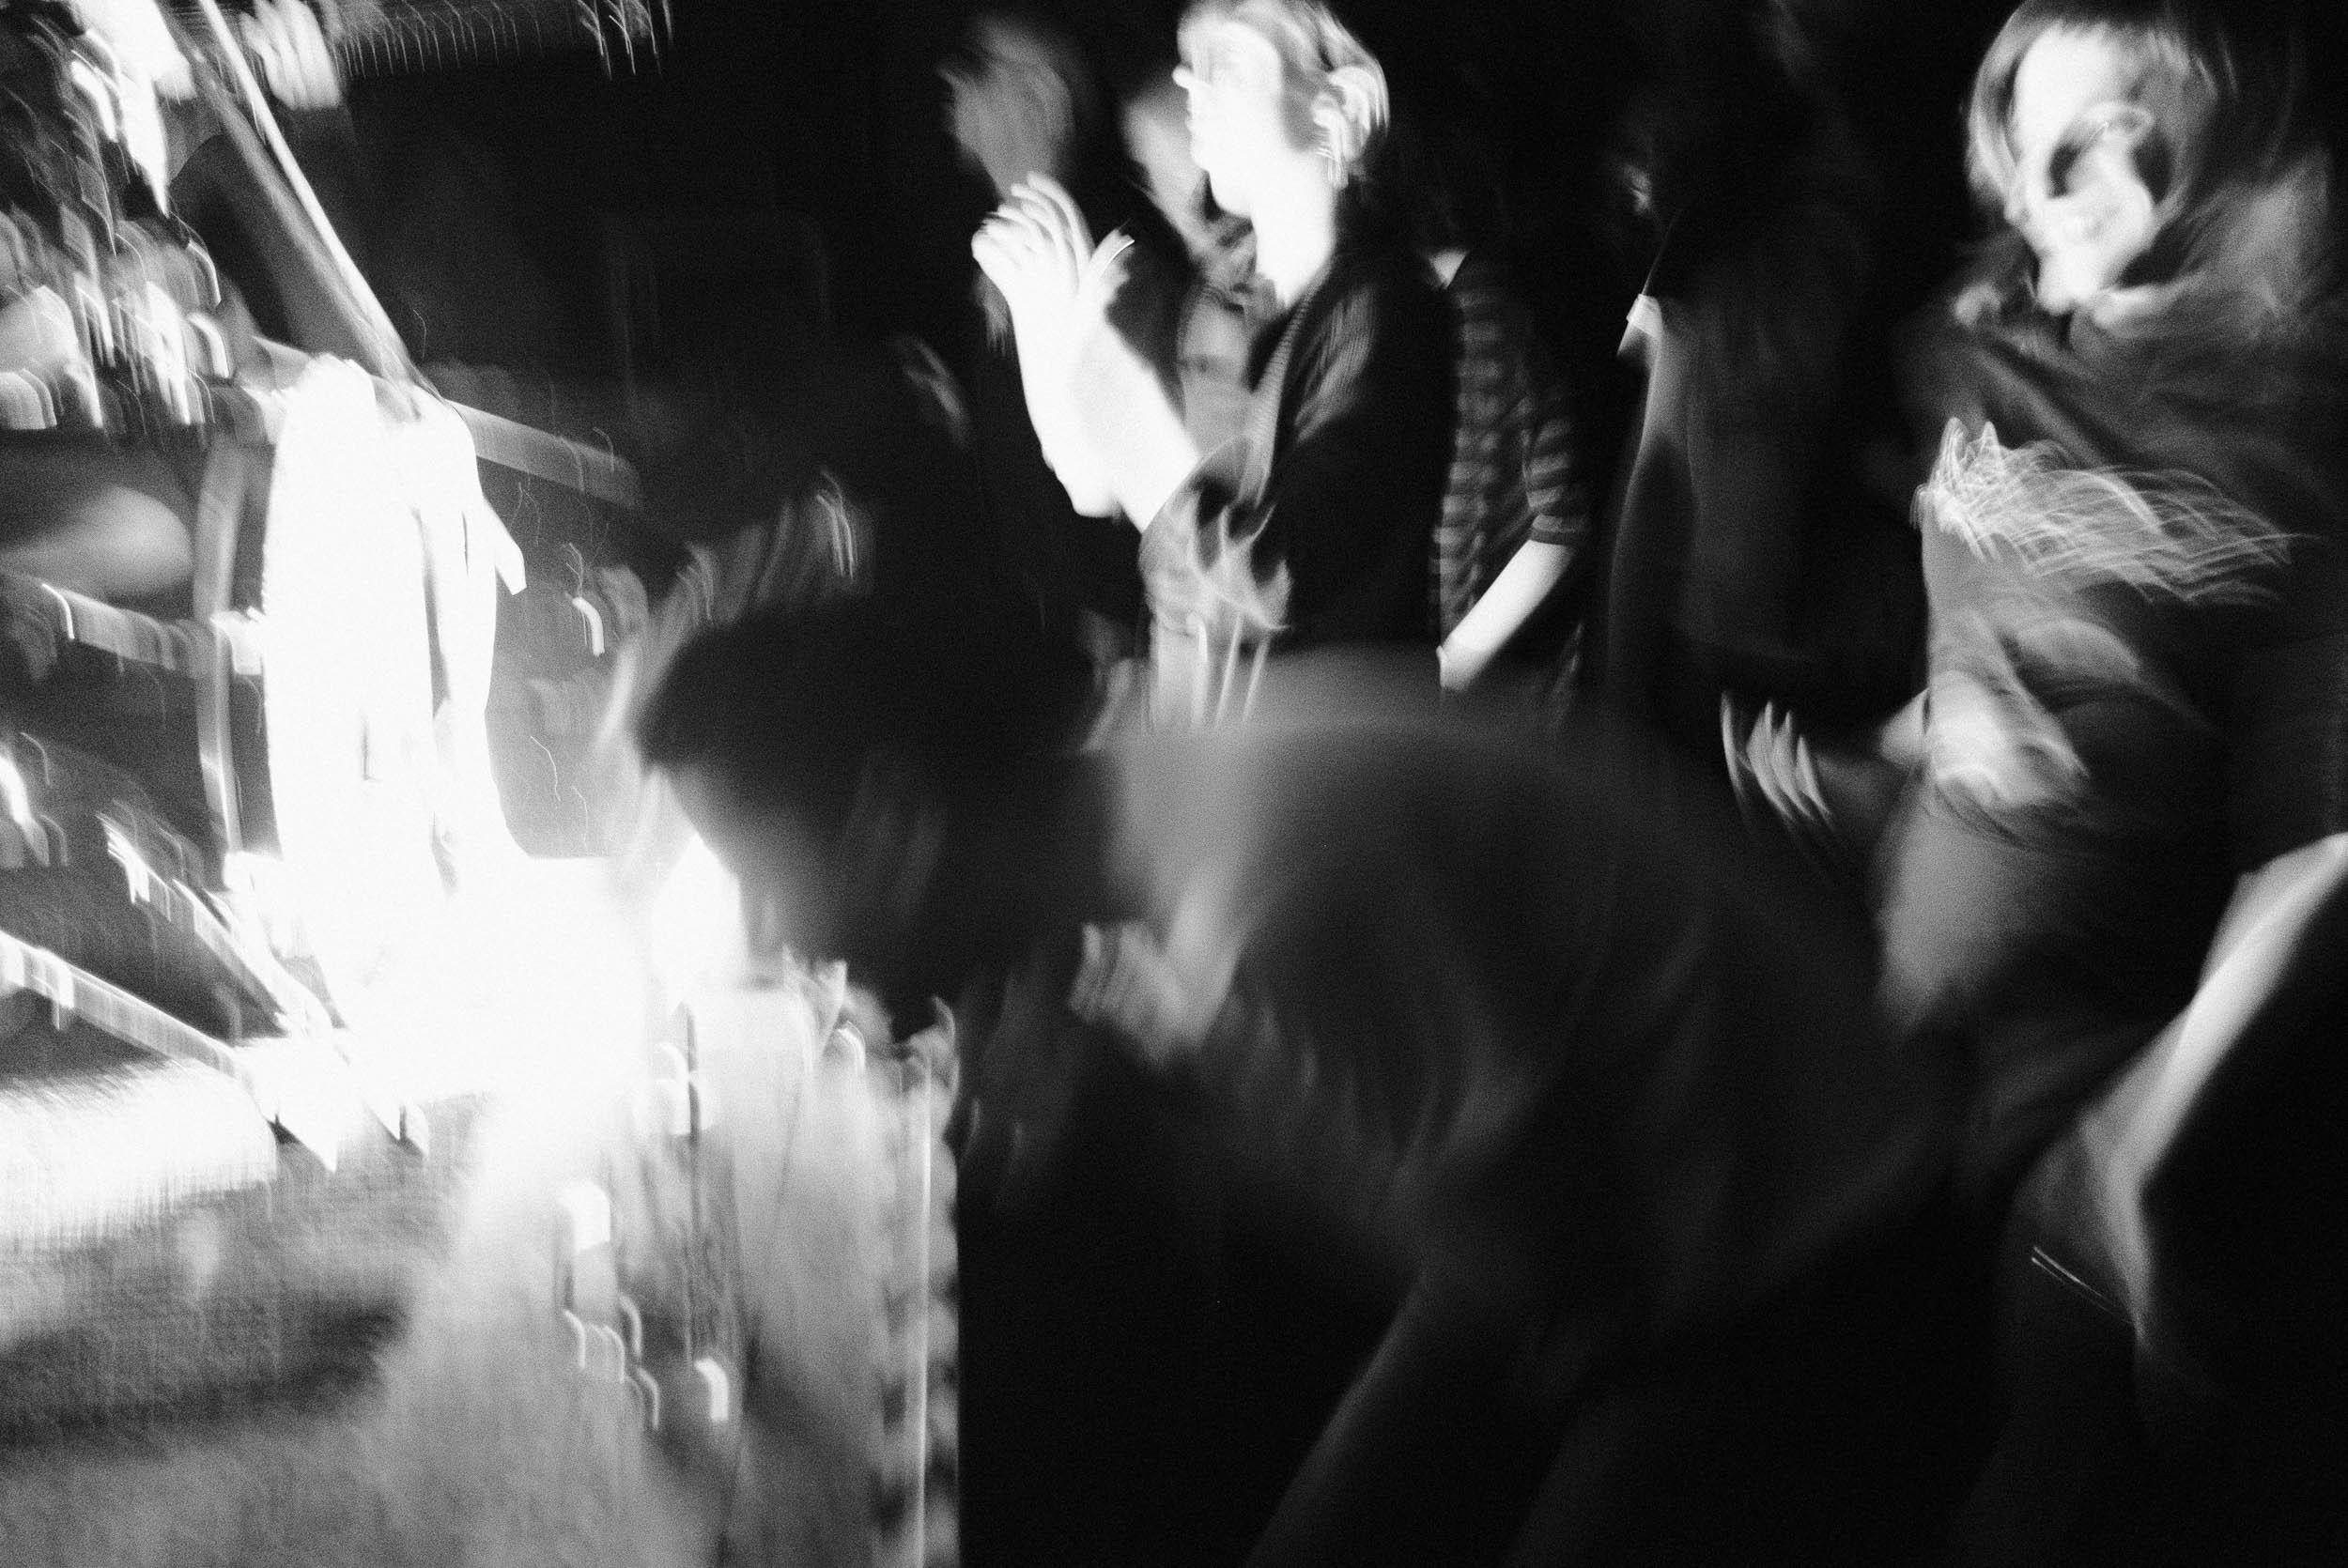 05.19.2017 Peyote, Istanbul.